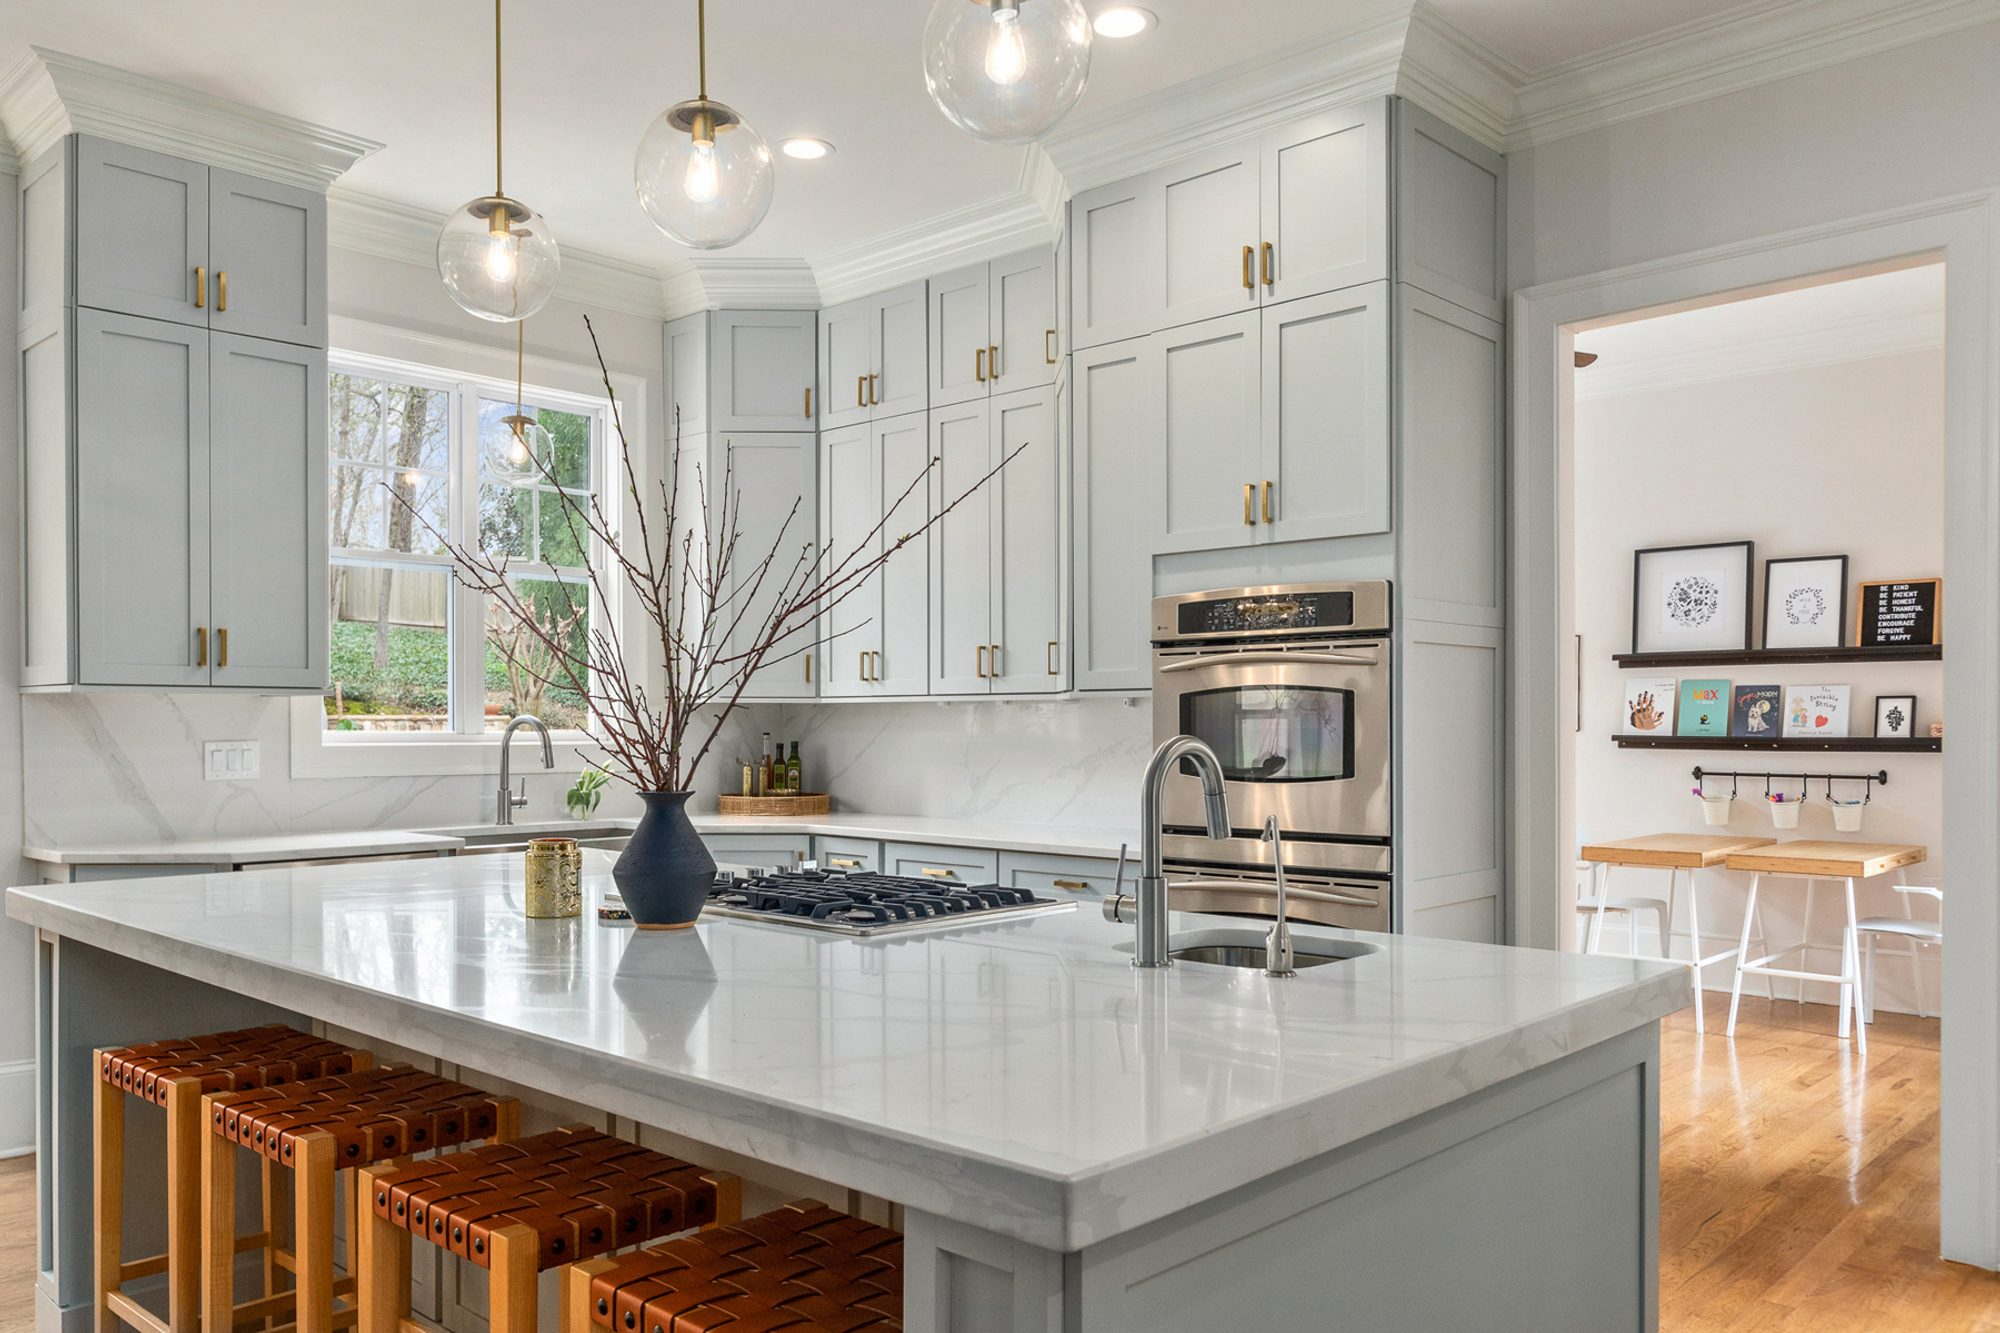 Pale gray shaker style cabinets with solid slab marble quartz backsplash.